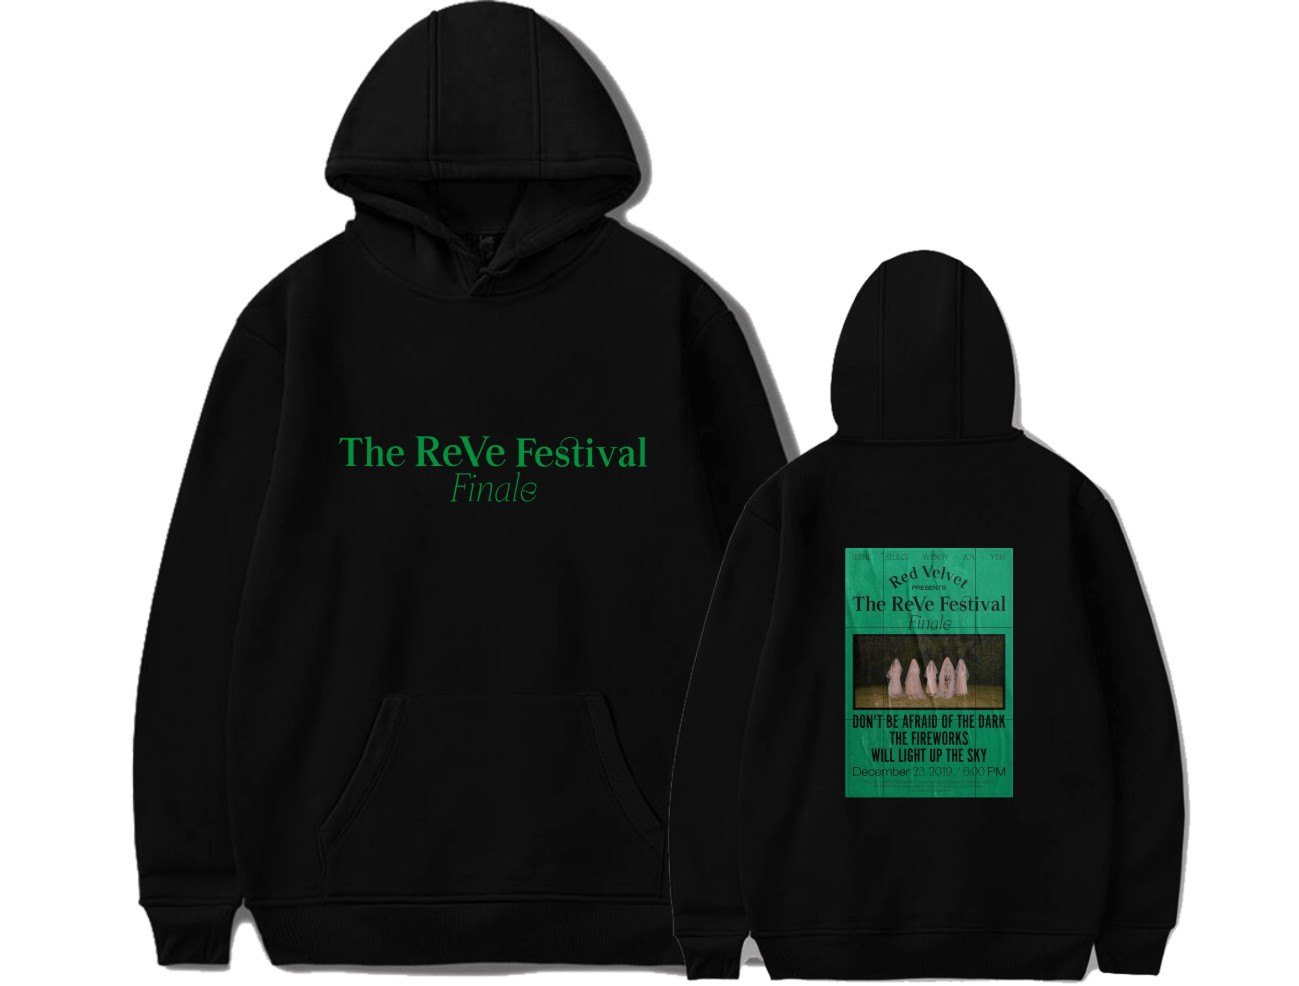 Red Velvet Album TheReVe Festival Finale Printed Hoodies Women/Men Hooded Sweatshirts Kpop Hot Sale Trendy Streetwear Outerwear